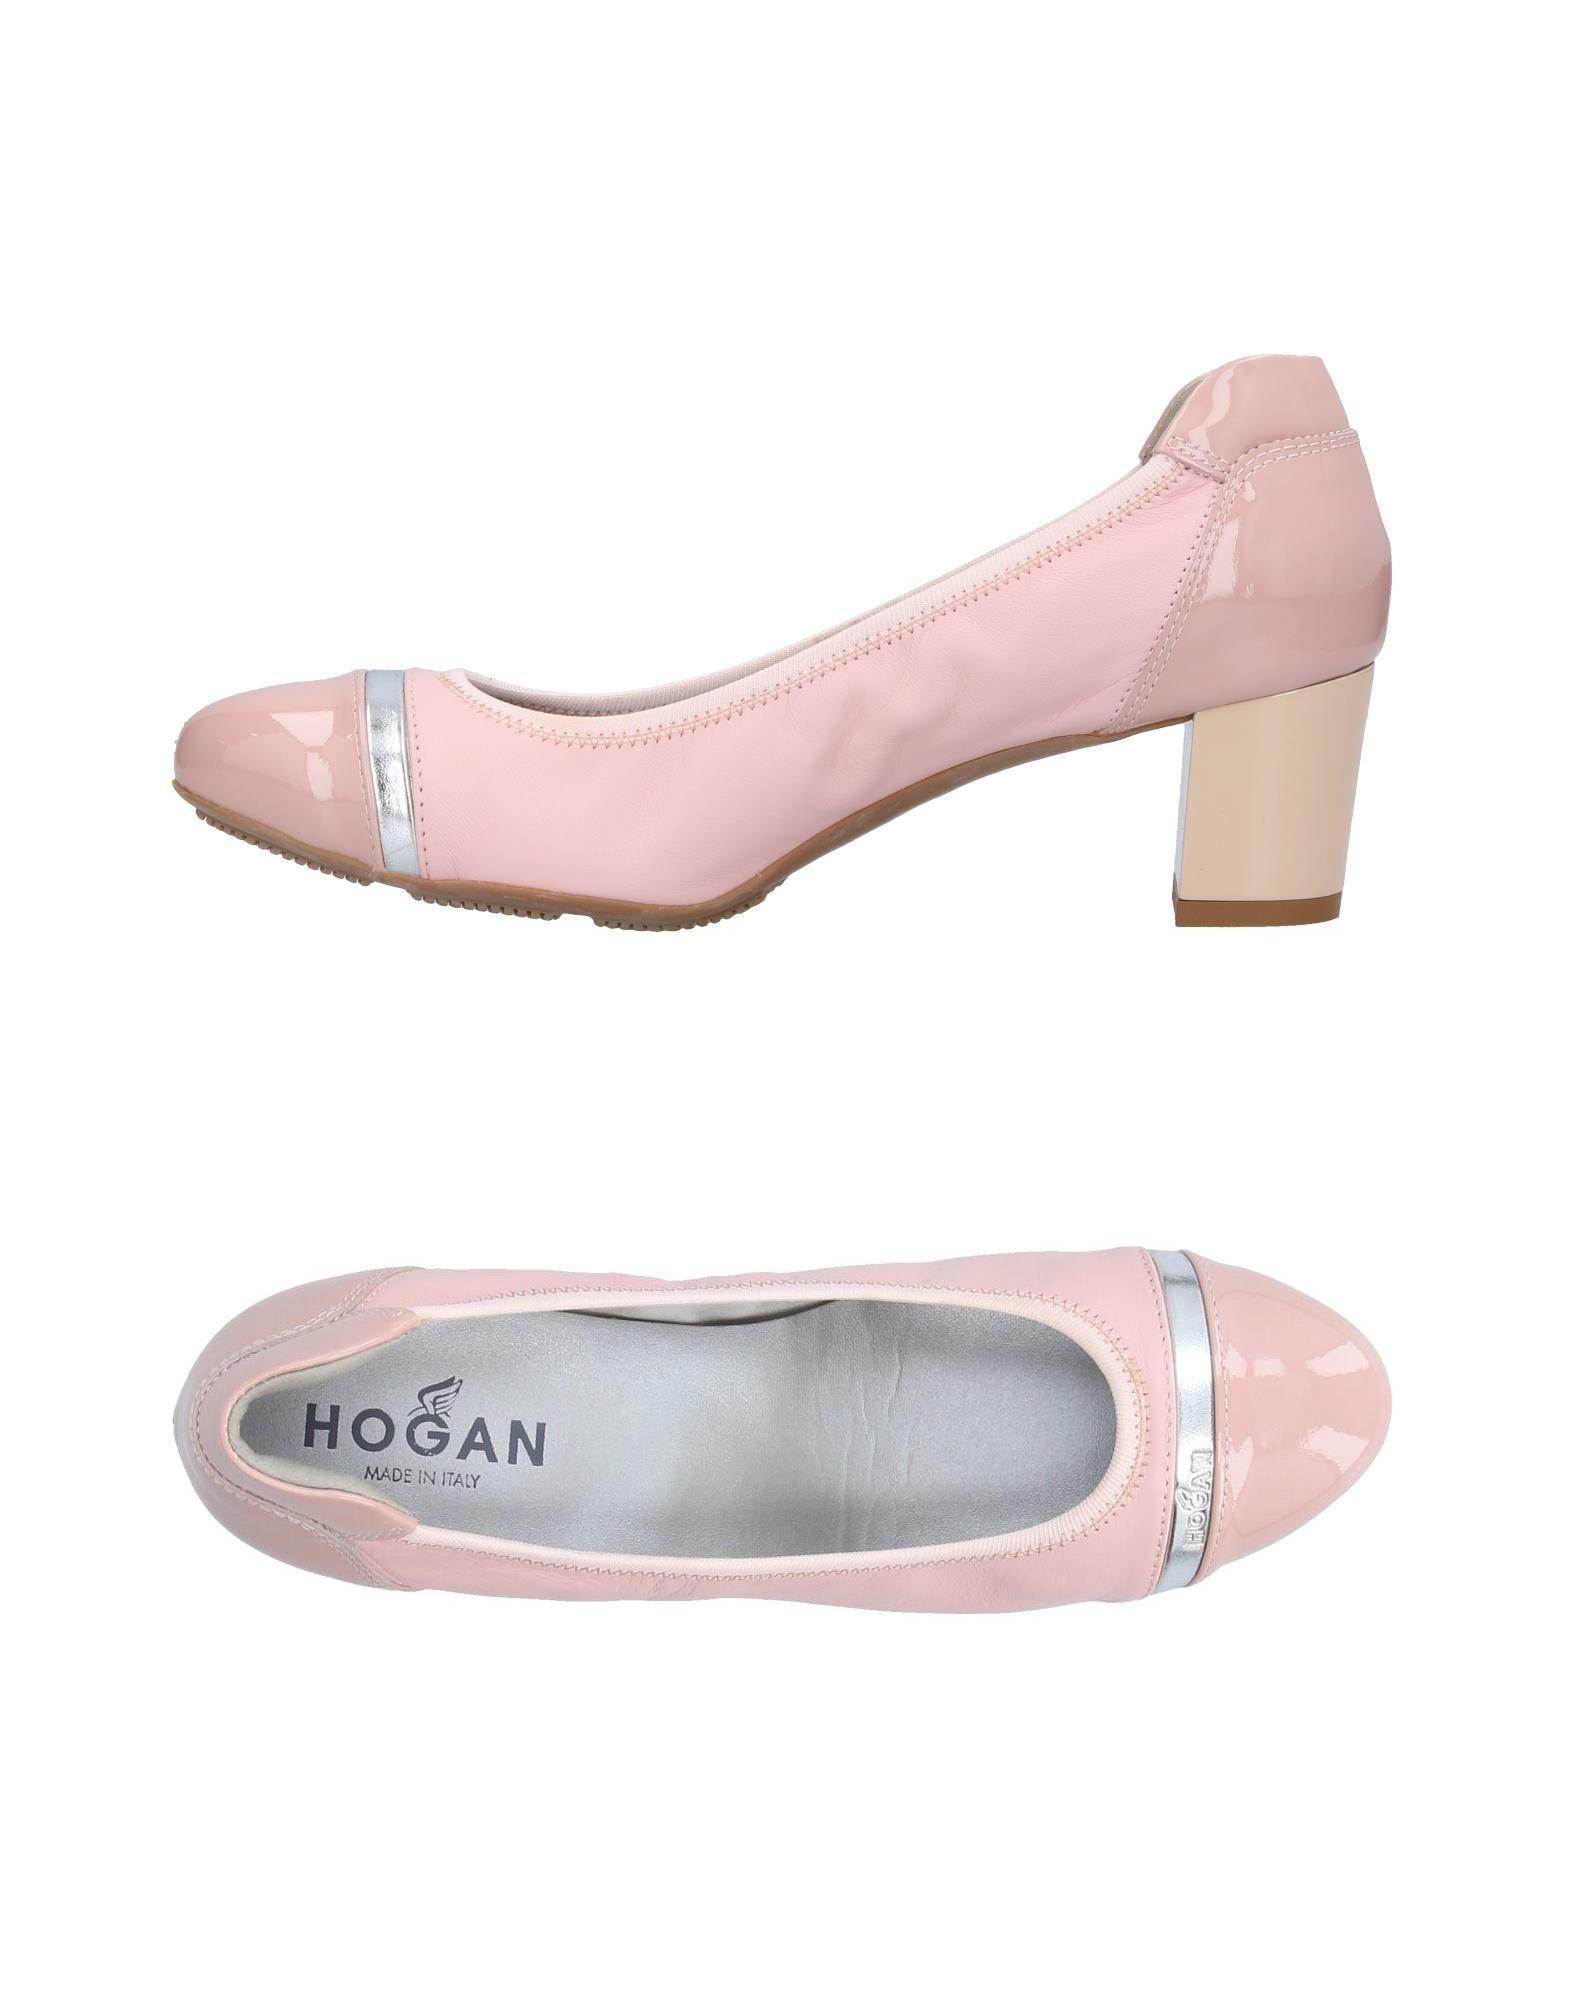 Hogan Pumps Damen  11398946OWGut aussehende strapazierfähige Schuhe